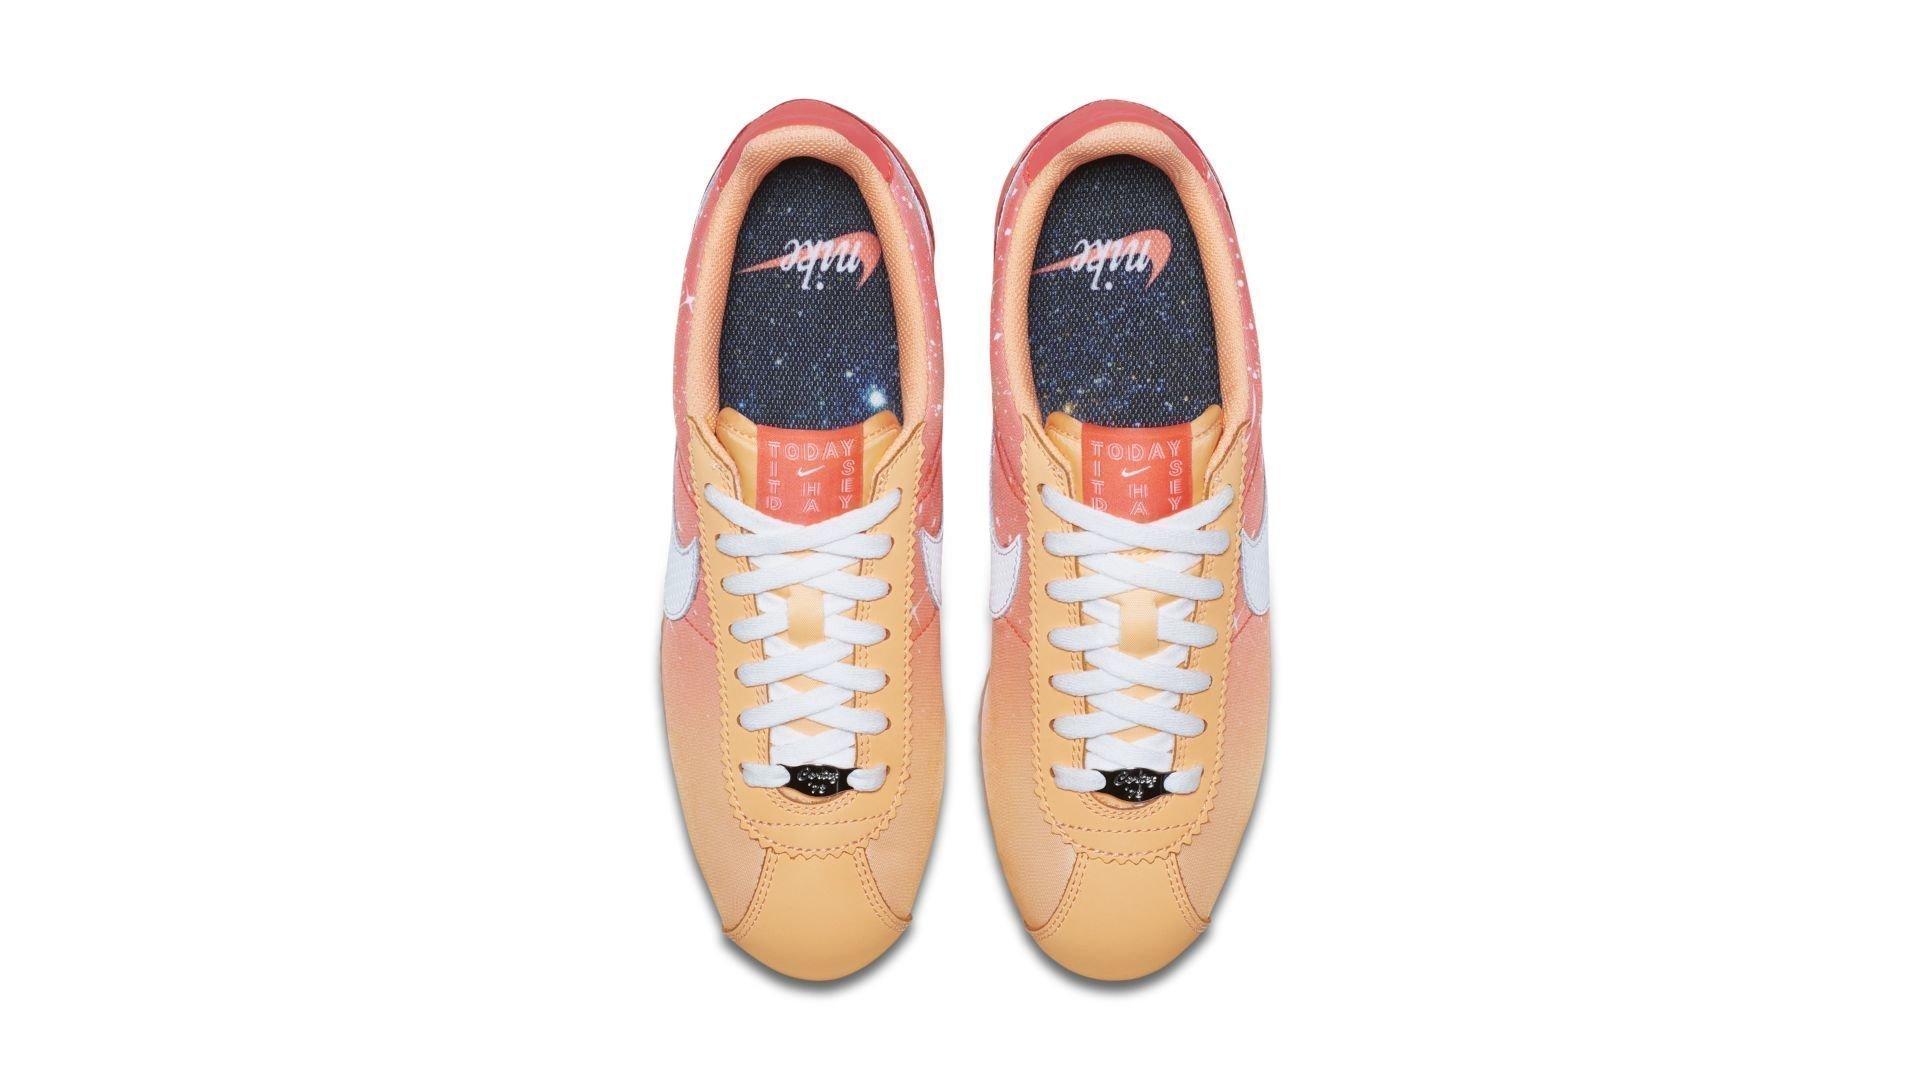 Nike Cortez Nylon Qixi Festival 2018 (W) (BV9263-600)